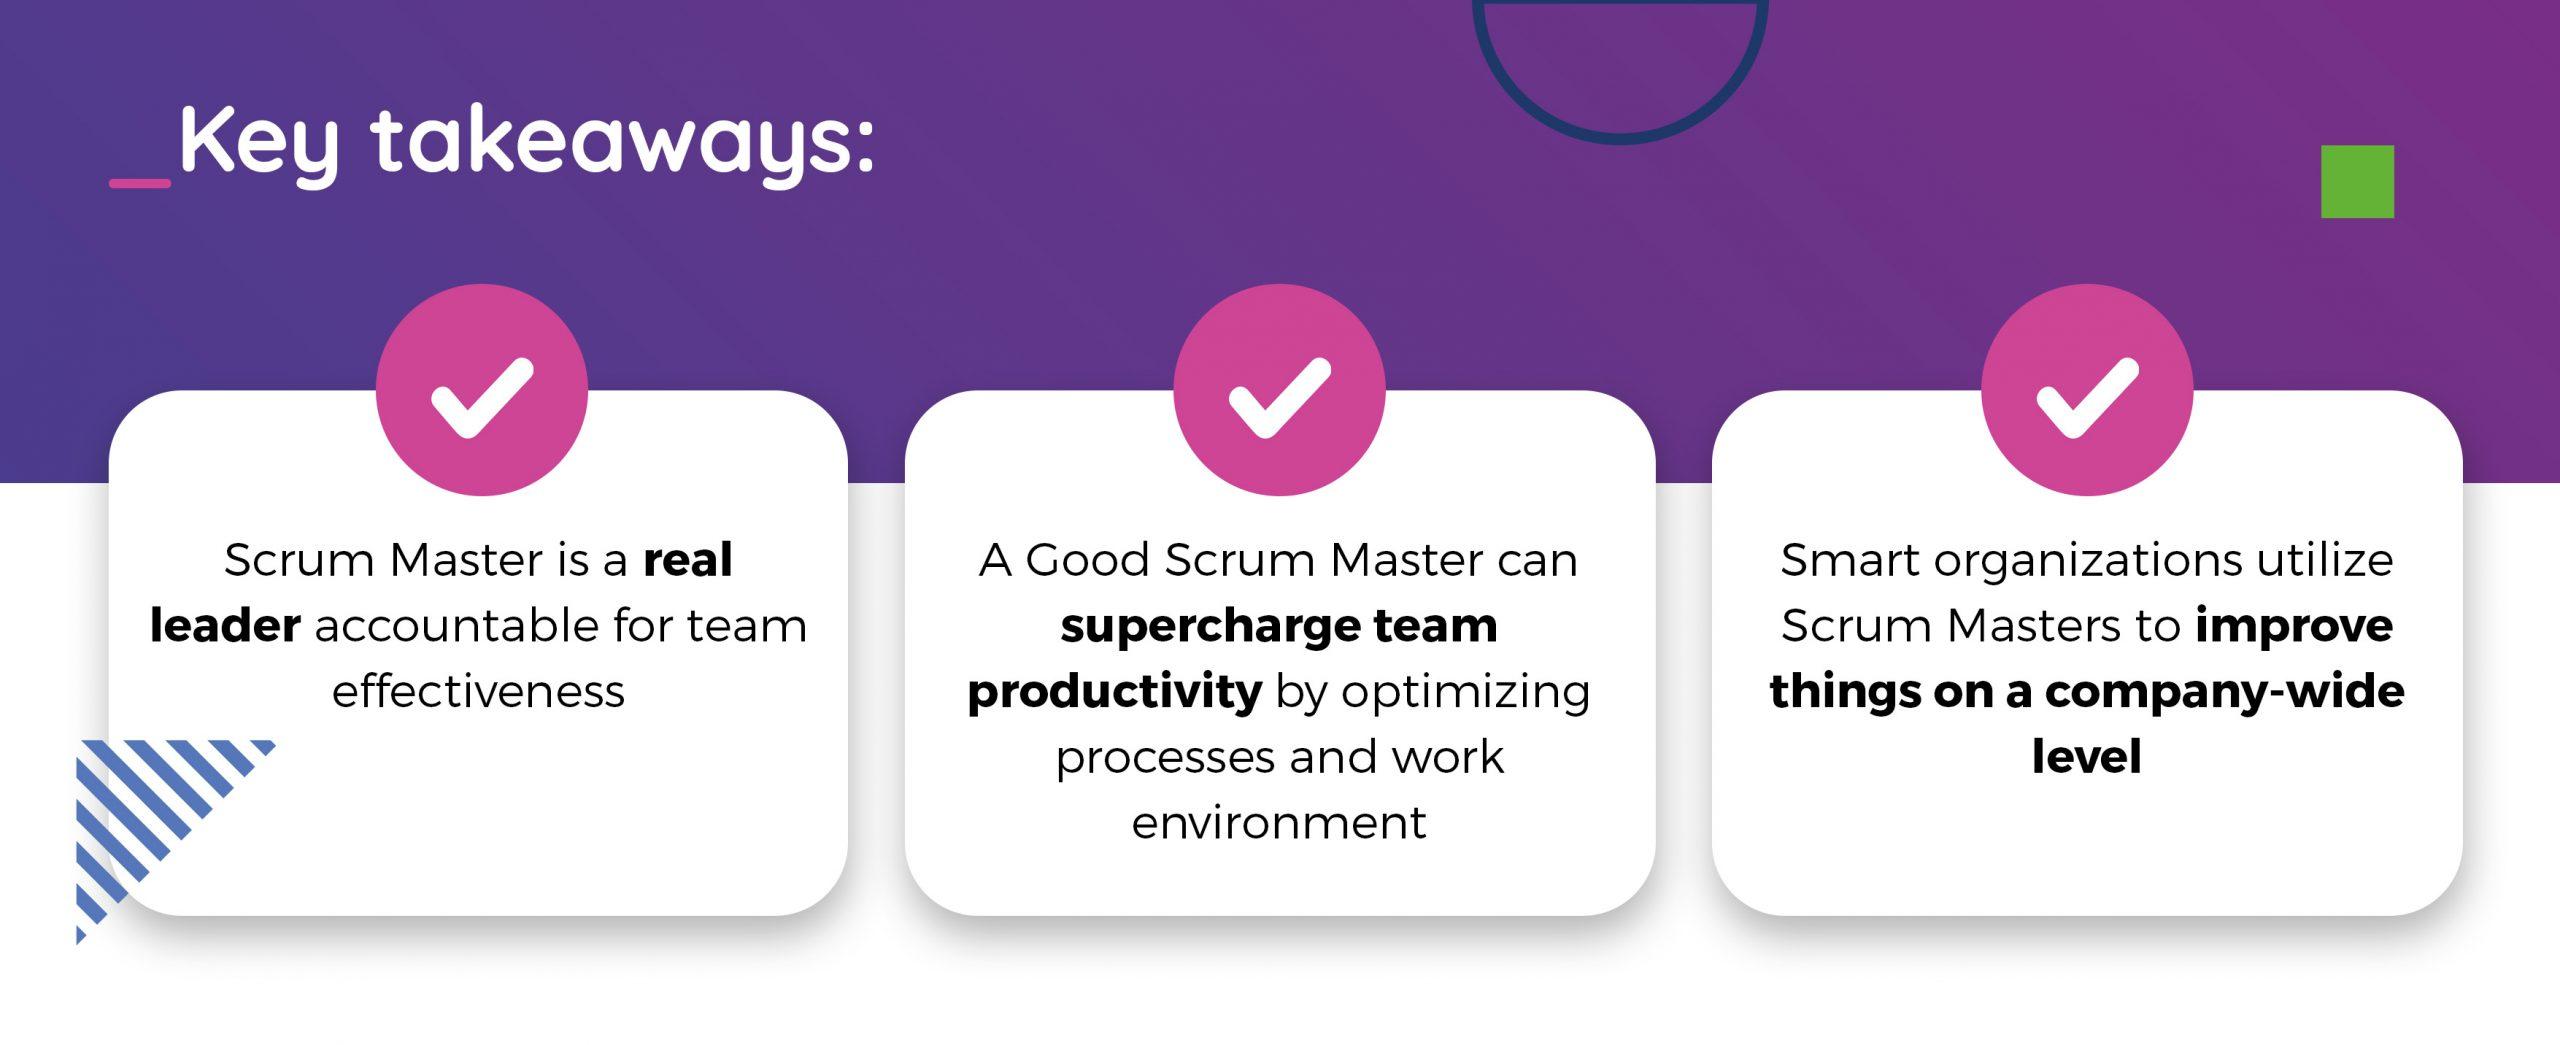 Scrum Master role is not really important- key takeaways TT PSC